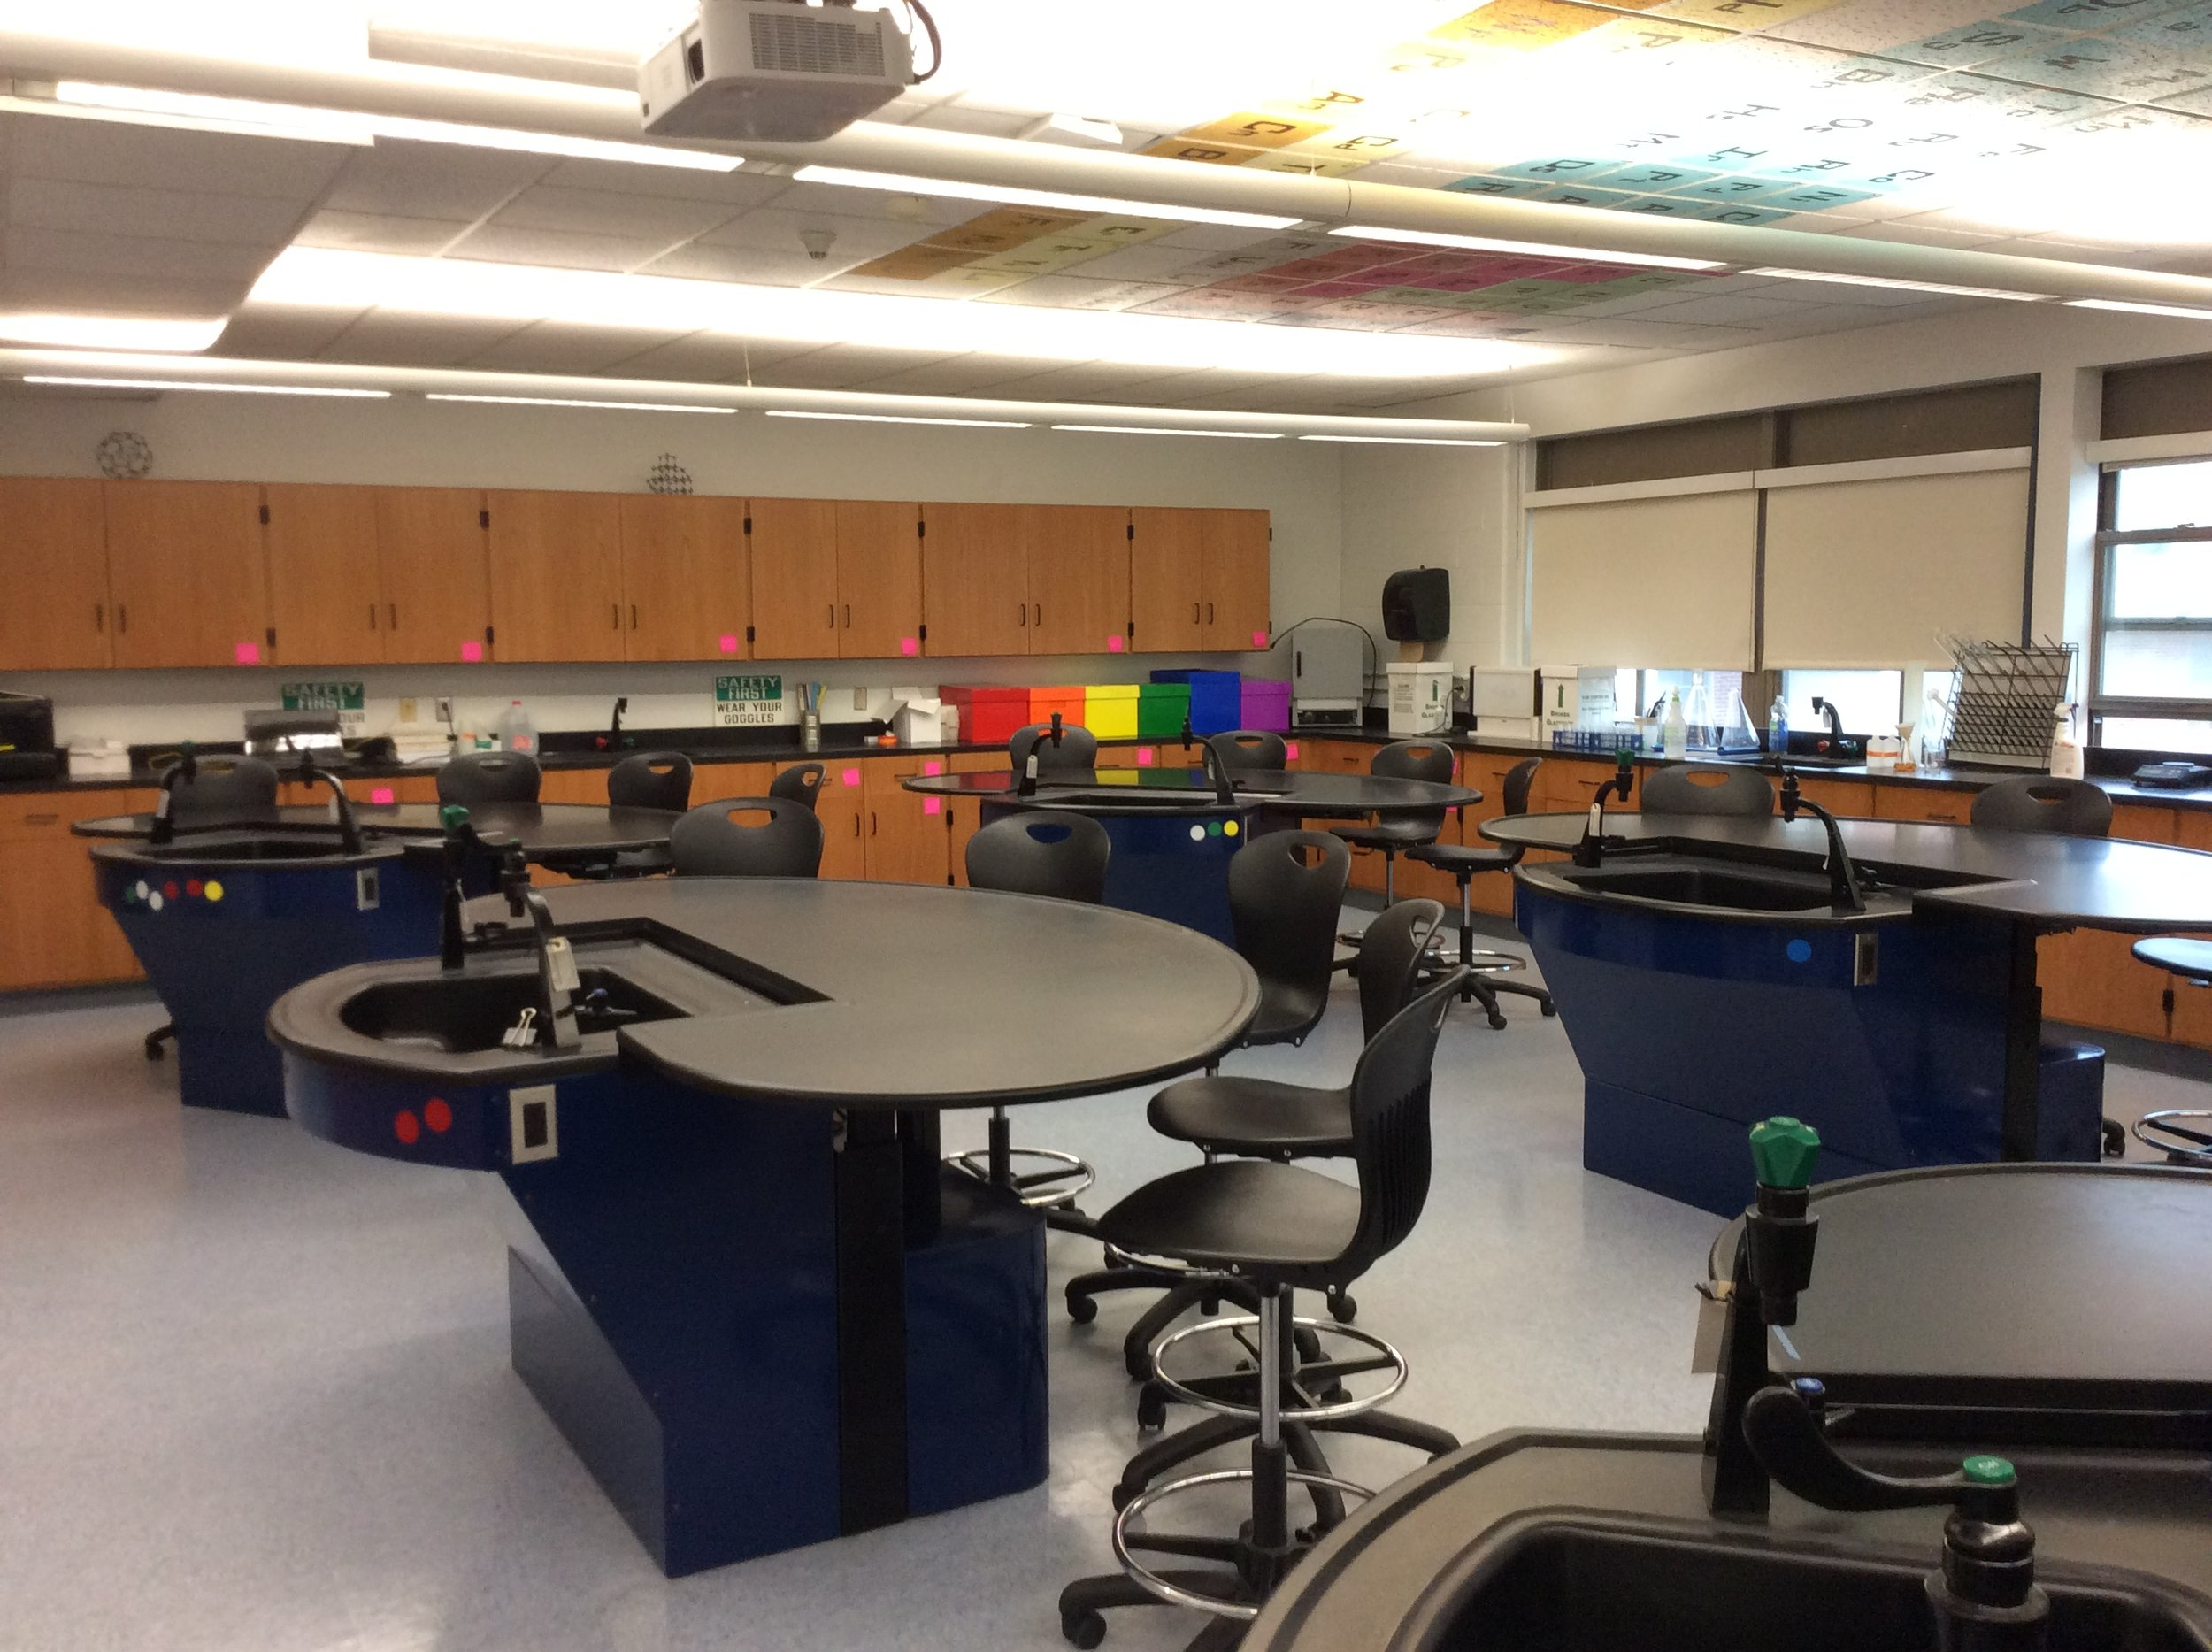 Axis Table High School Laboratory.JPG